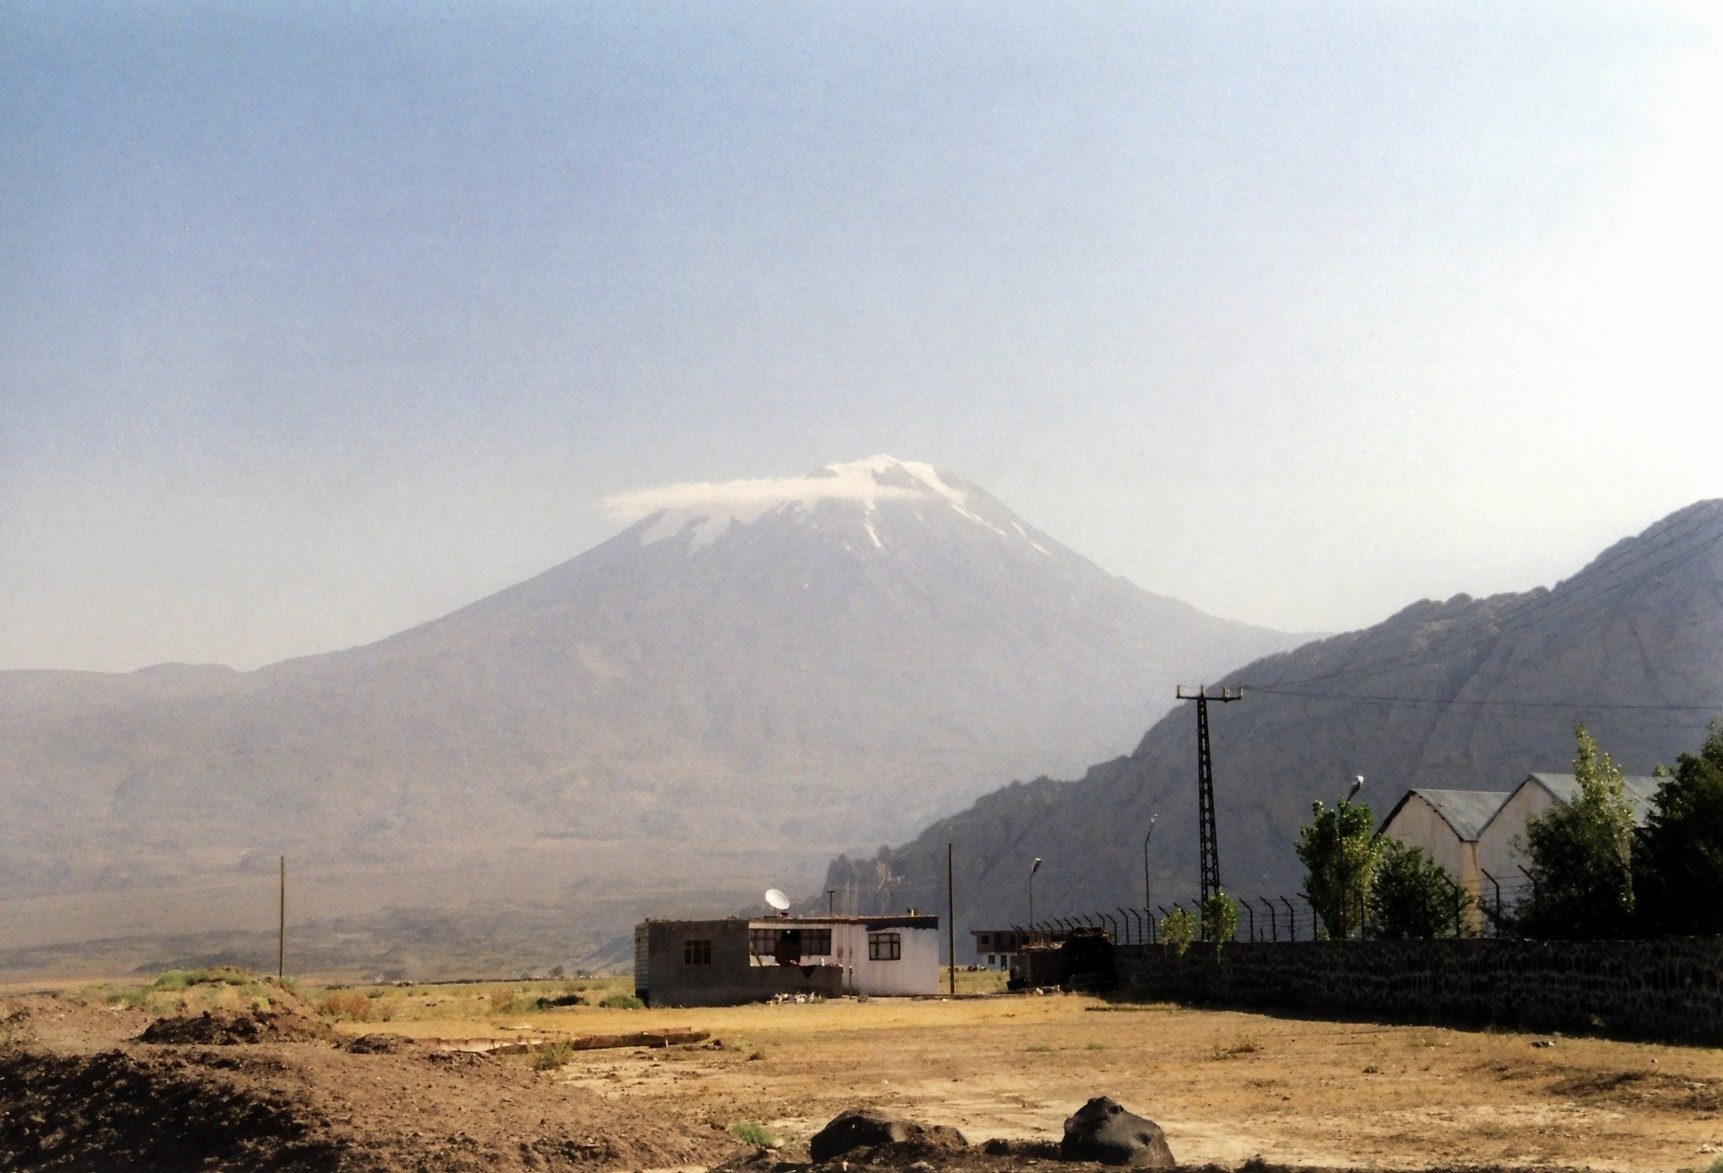 Mount Ararat from east of Dogubeyazit, Turkey